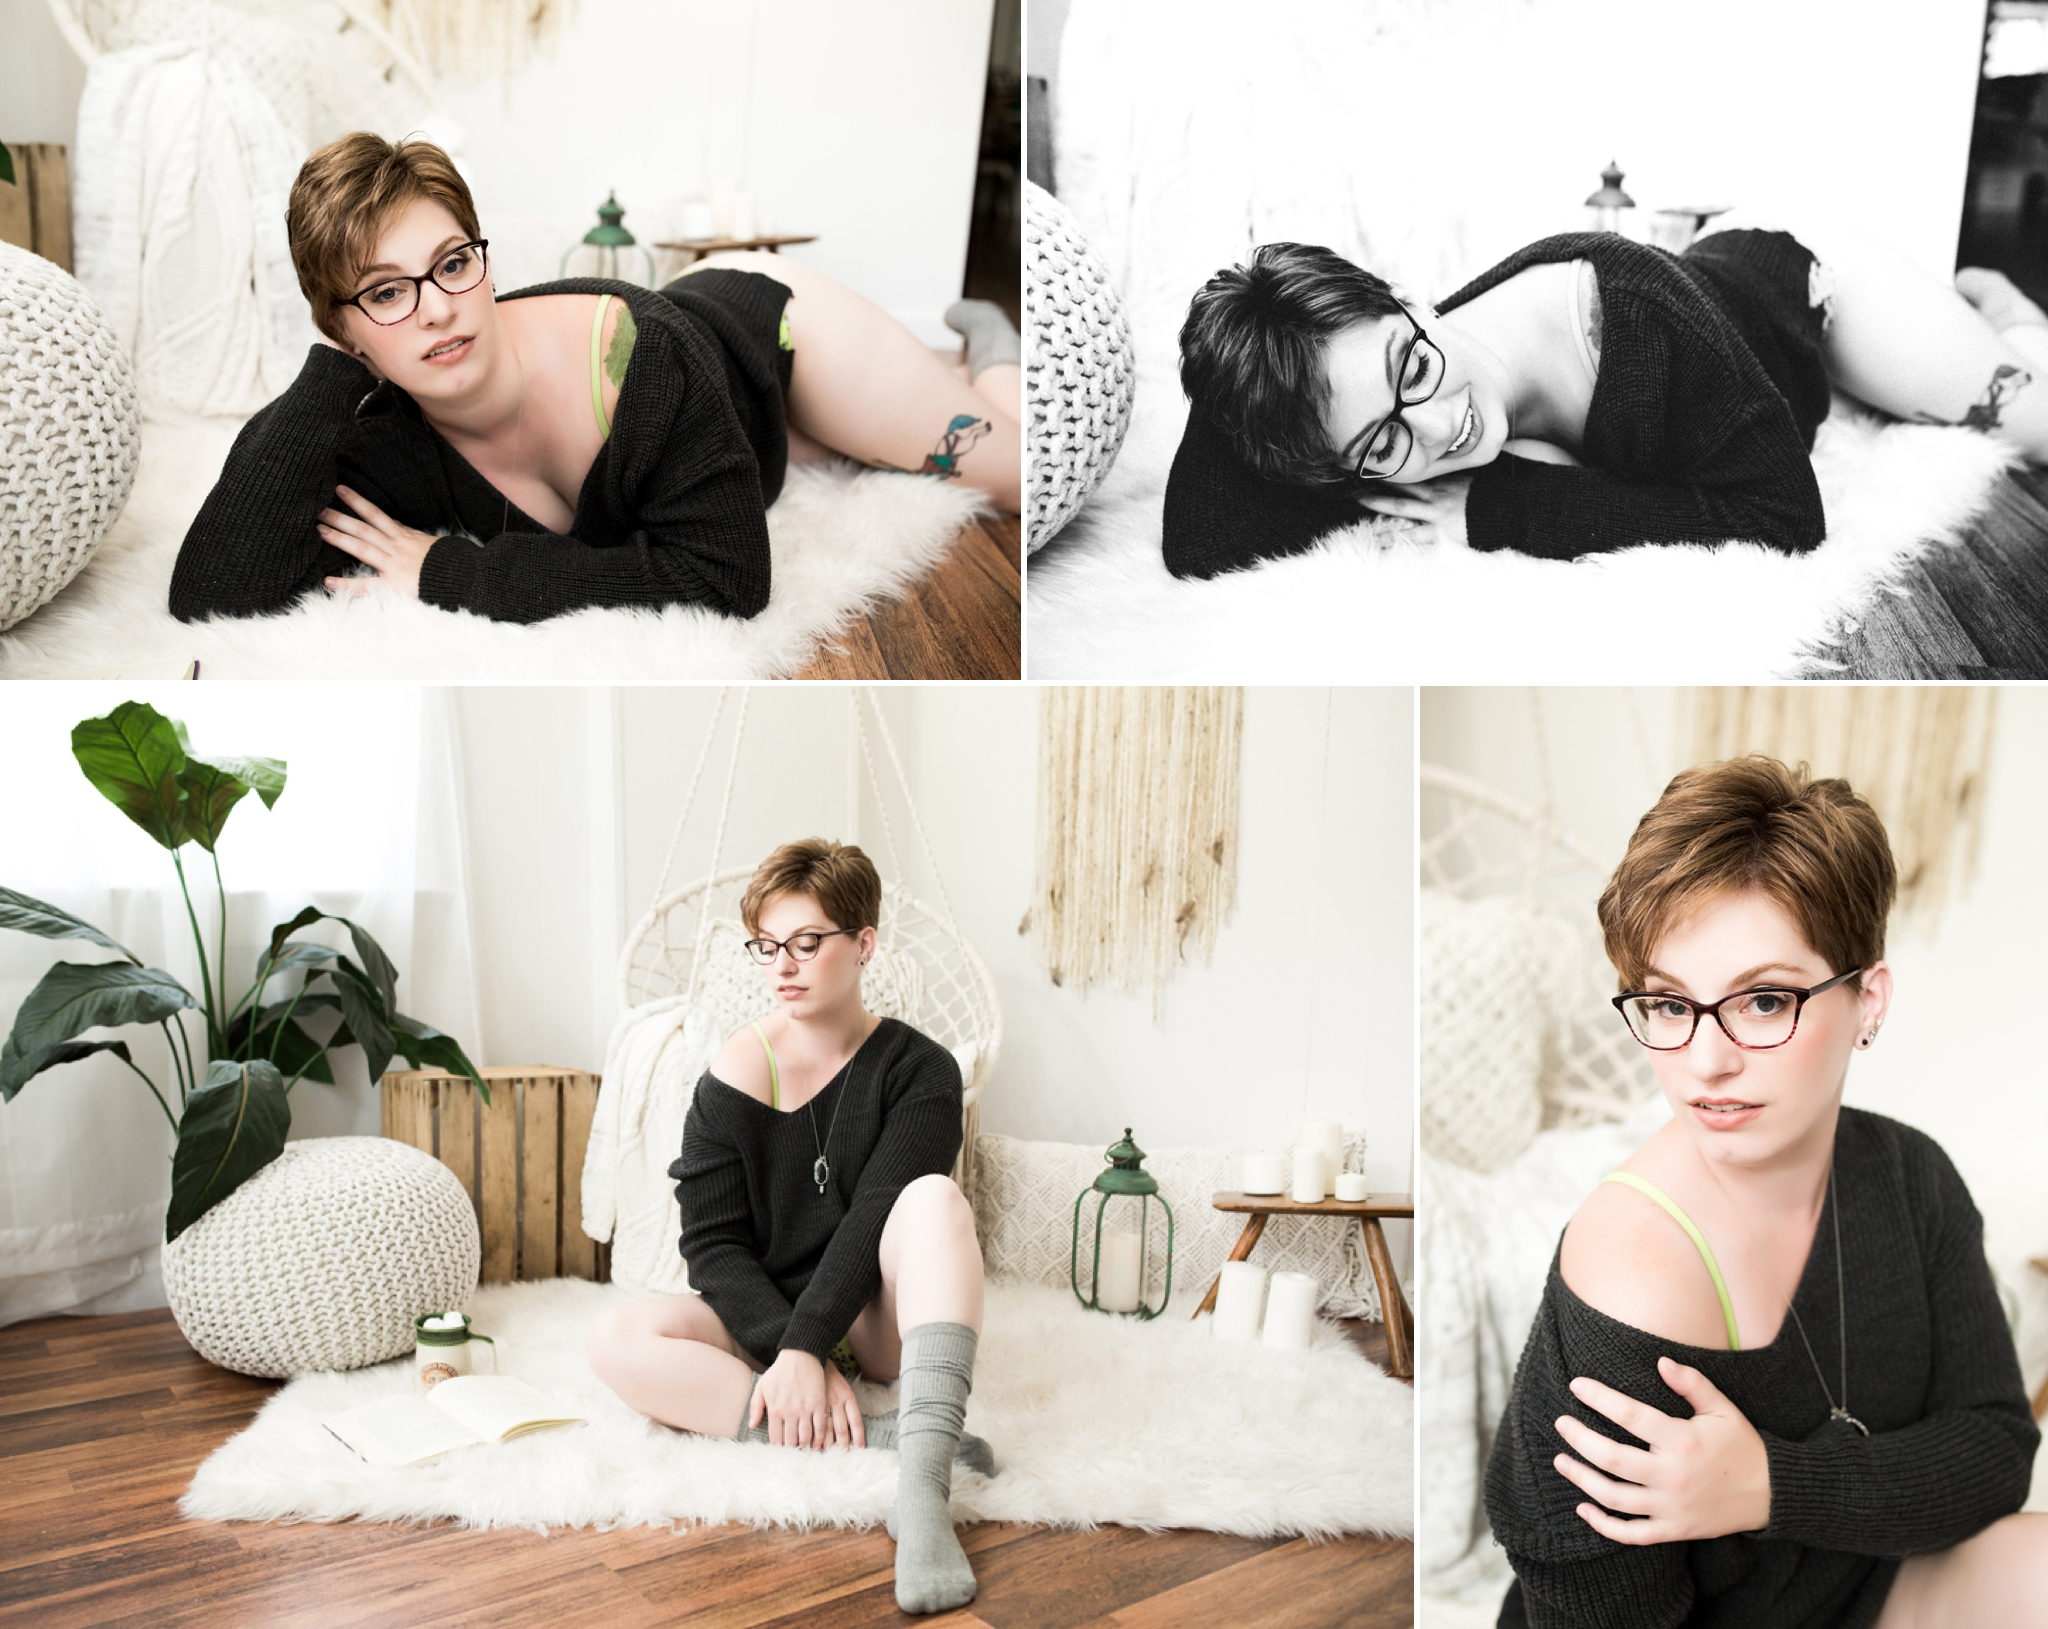 Emily Weston Collage 2.jpg